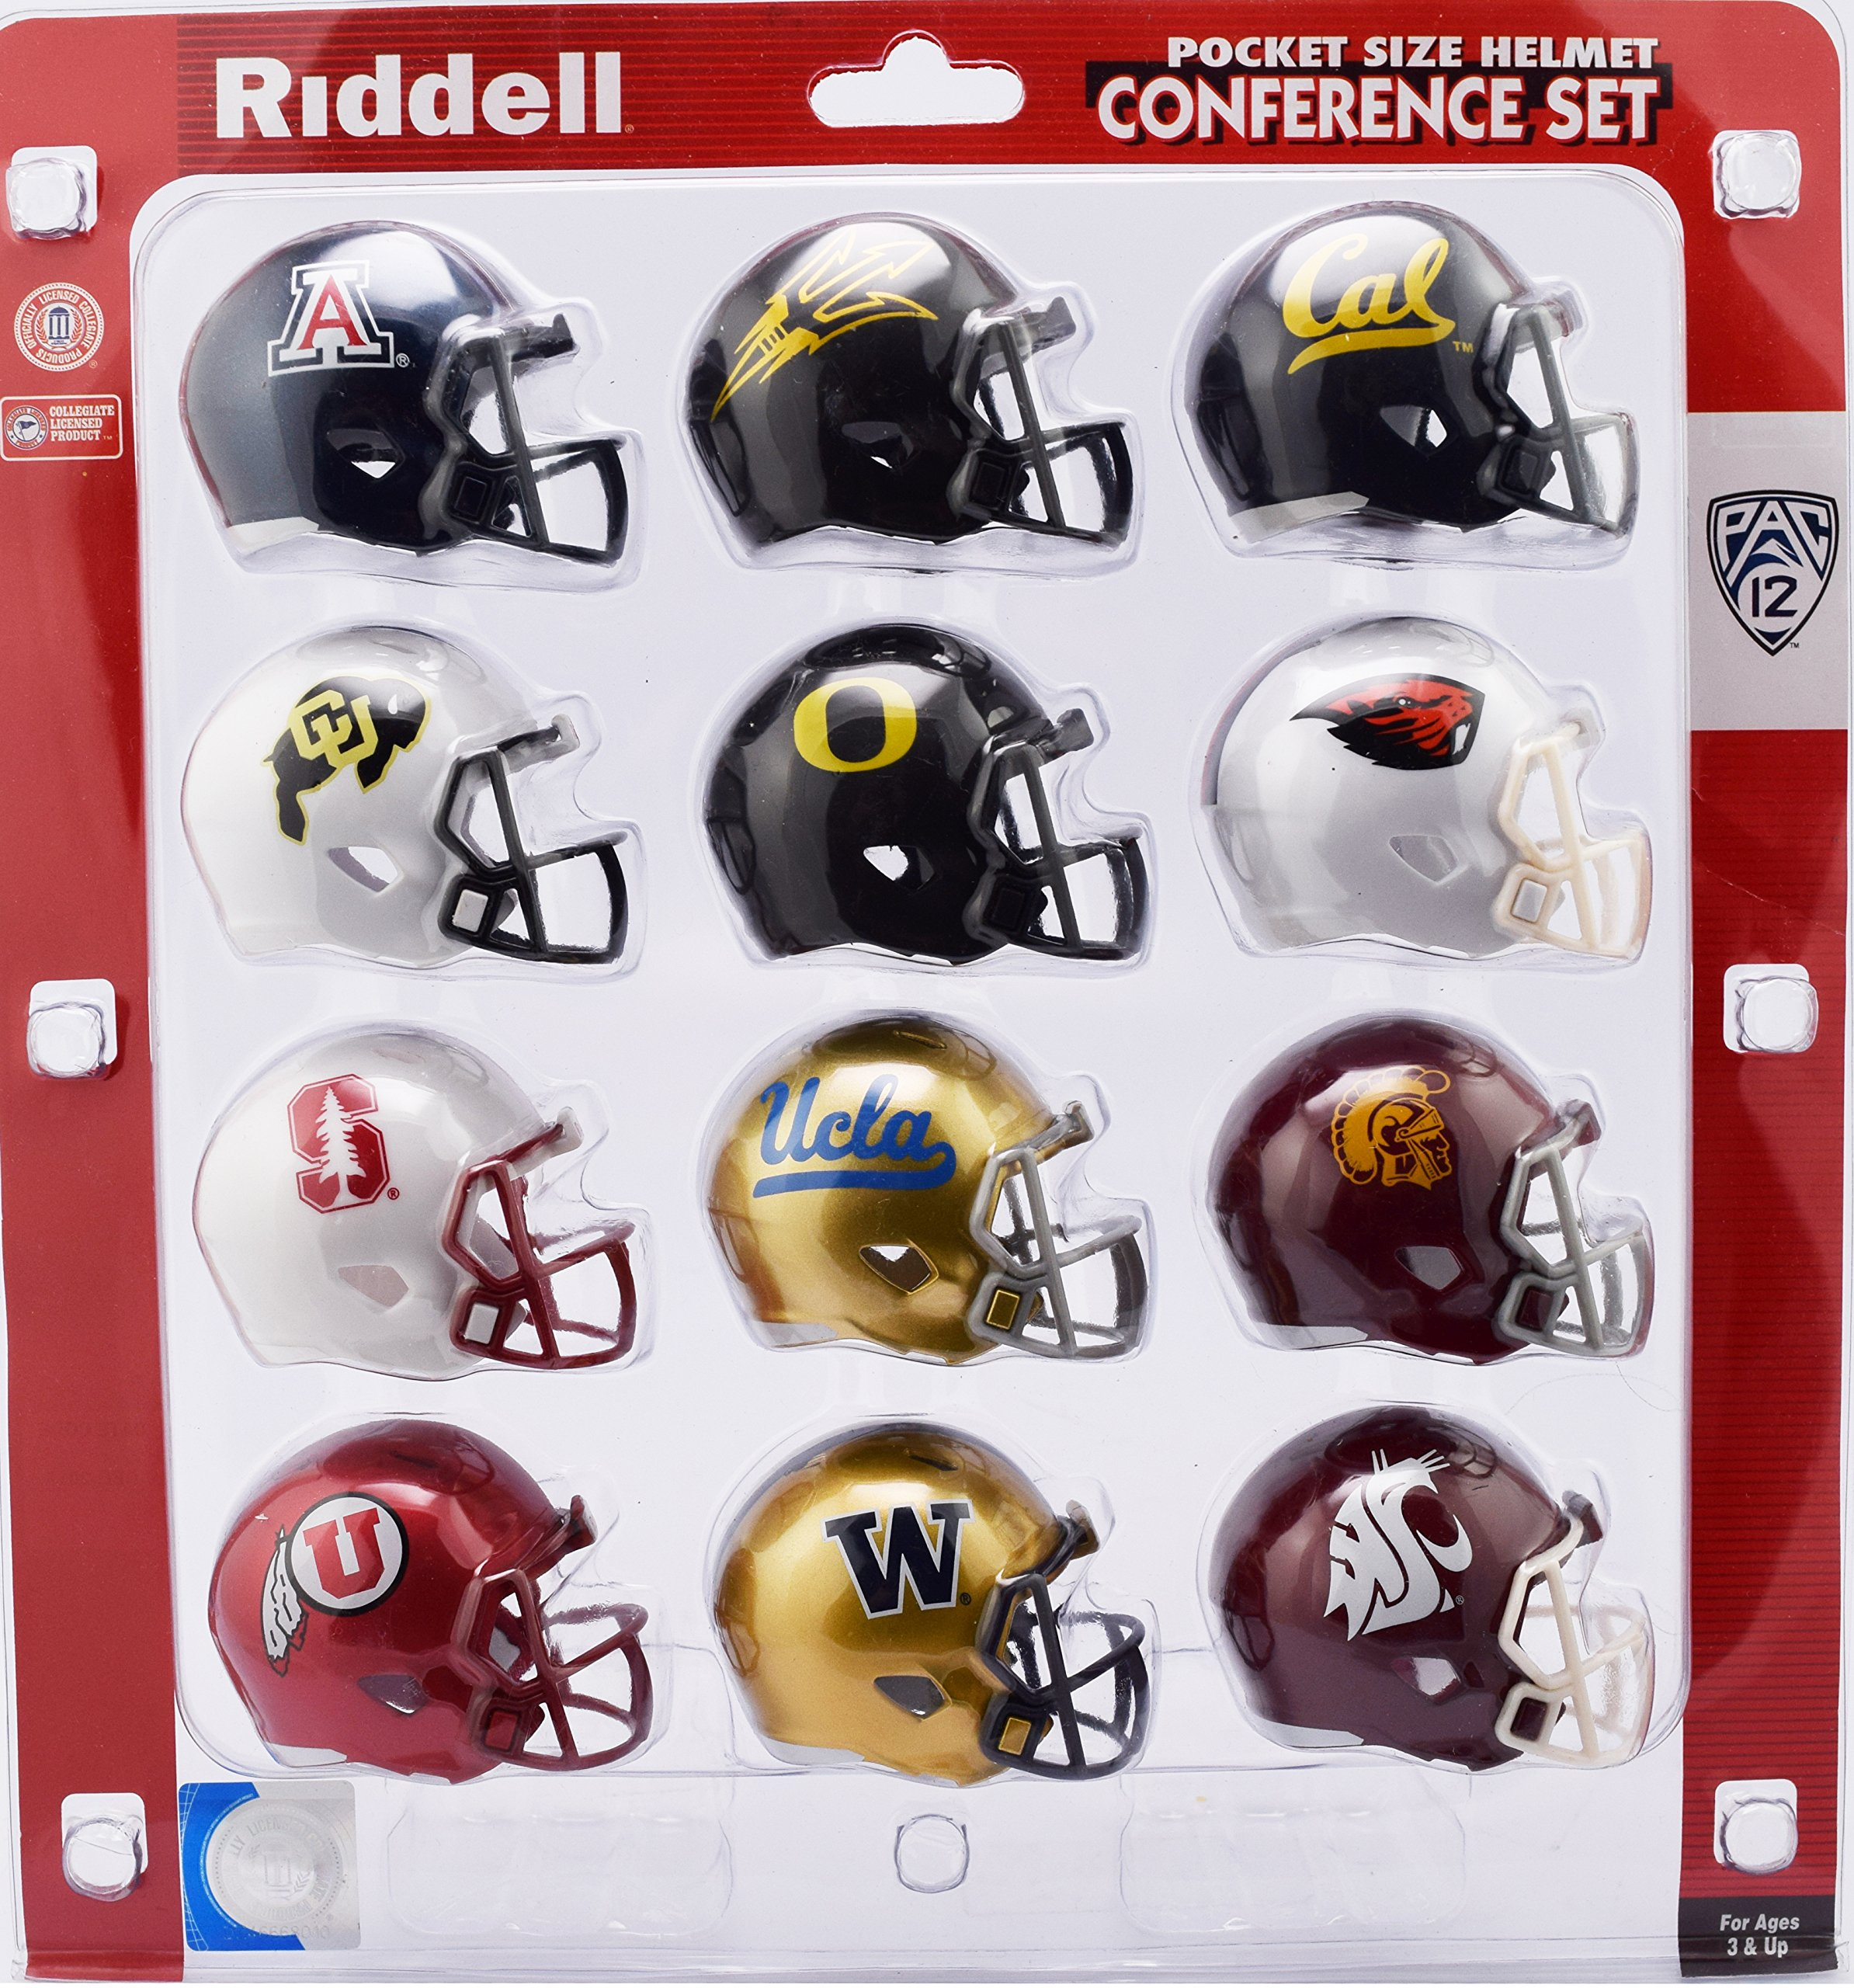 Riddell Pocket Pro Speed Helmet PAC 12 Conference Set 12 Helmets Arizona, Arizona St, Cal, Colorado, Oregon, Oregon St, Stanford,UCLA,USC,Utah,Washington,Washington State Helmets 2018 Set